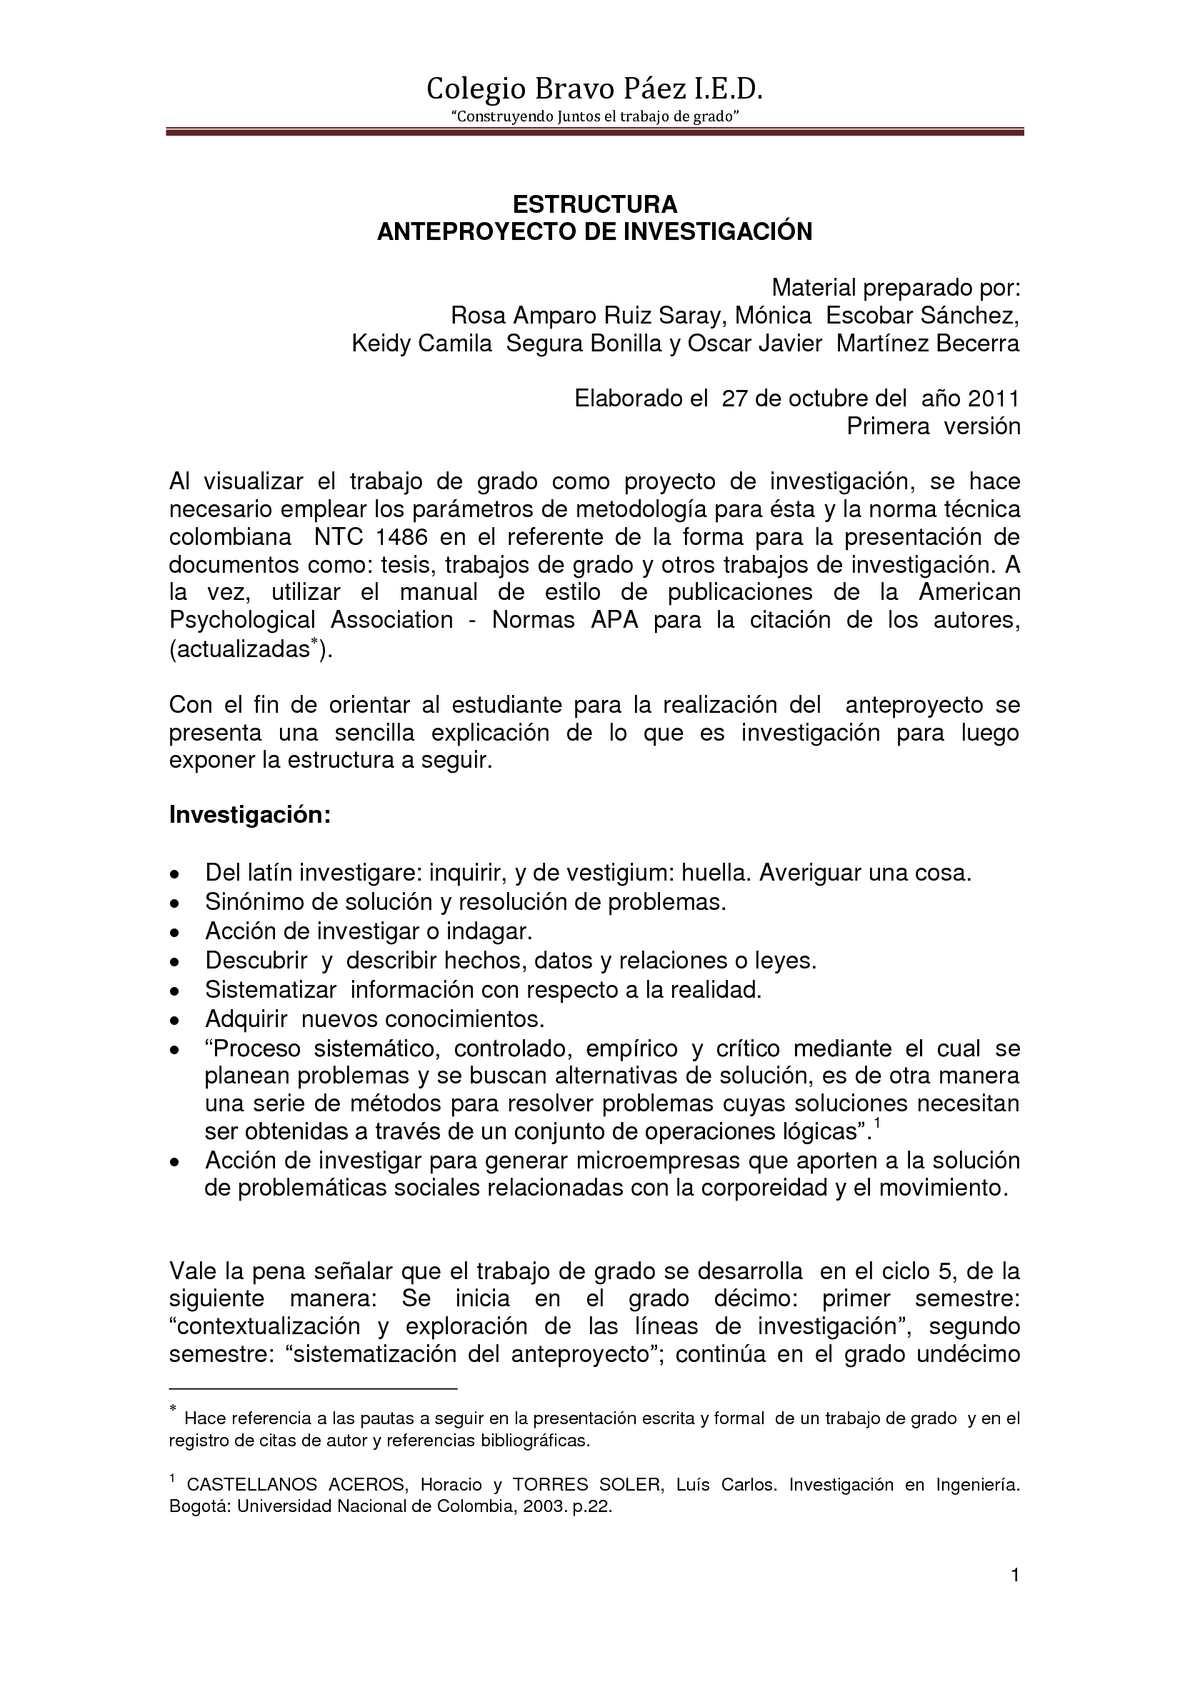 Calaméo Estructura Del Anteproyecto Colegio Bravo Páez I E D